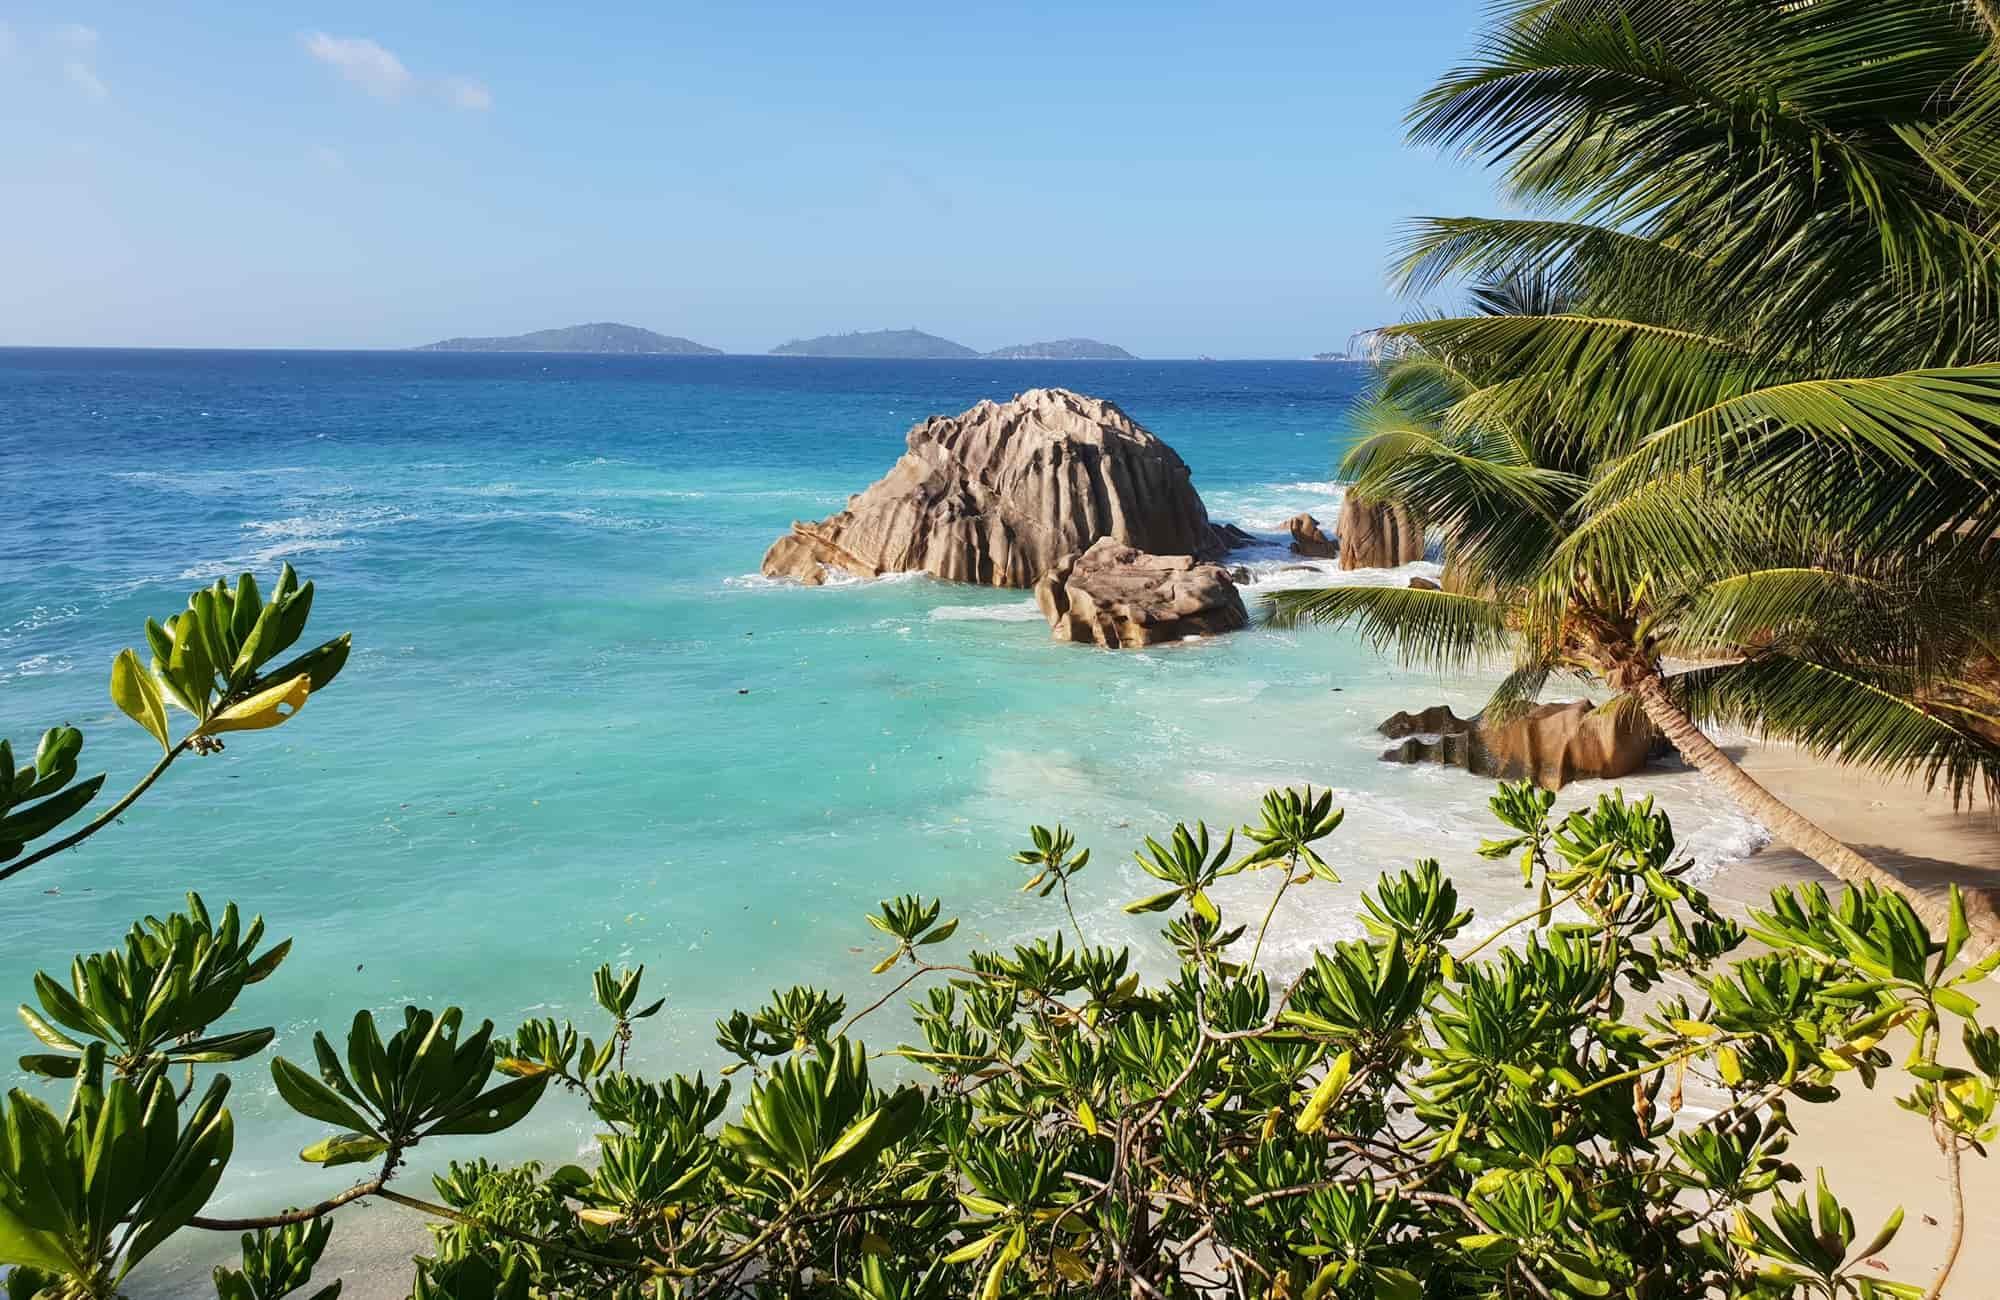 Voyage Seychelles - La Digue - Amplitudes